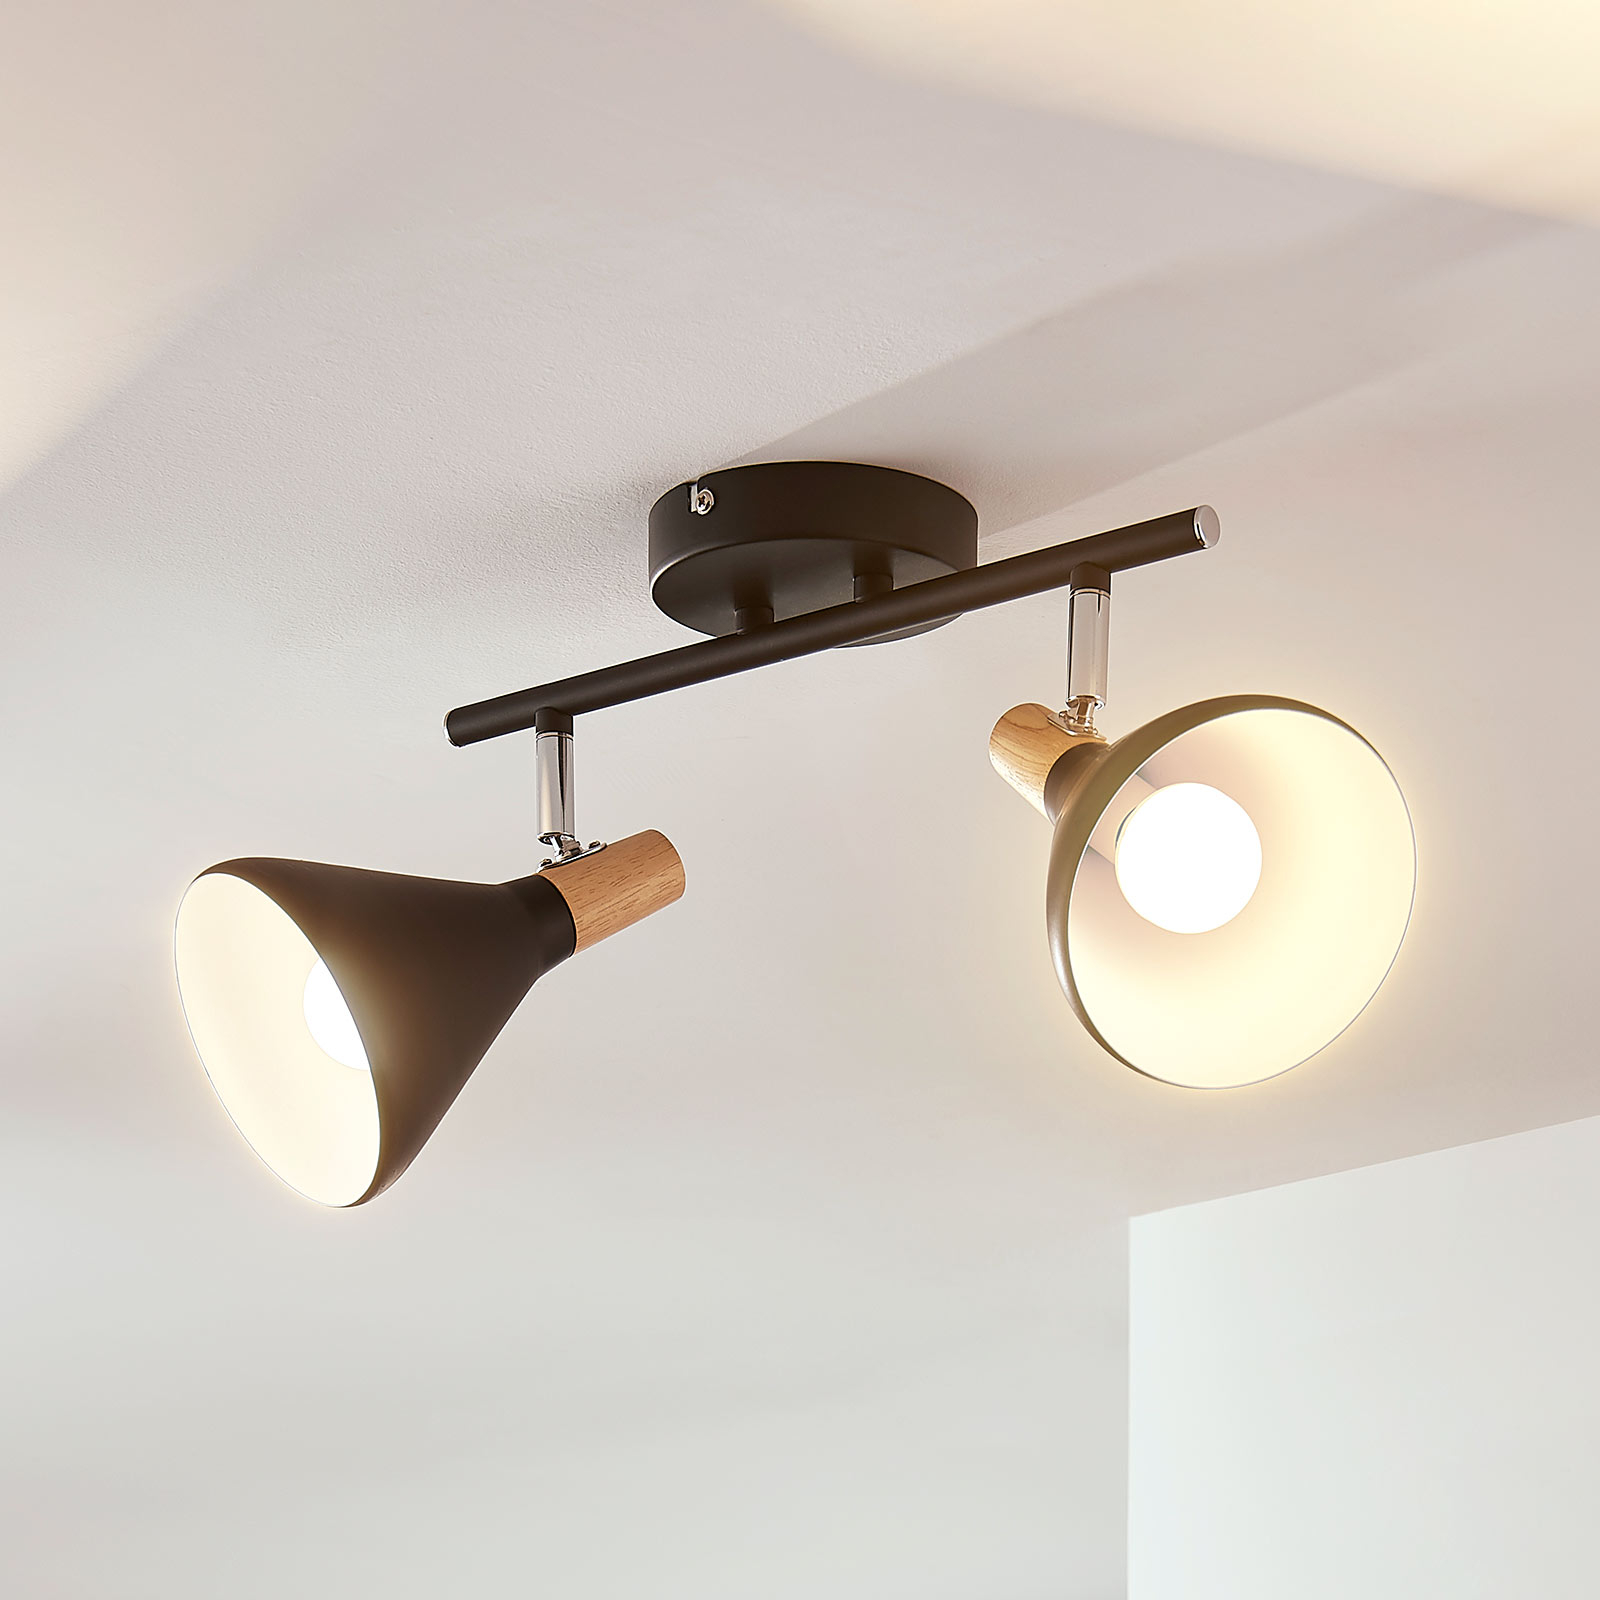 Lámpara LED de techo Arina de 2 brazos, negro